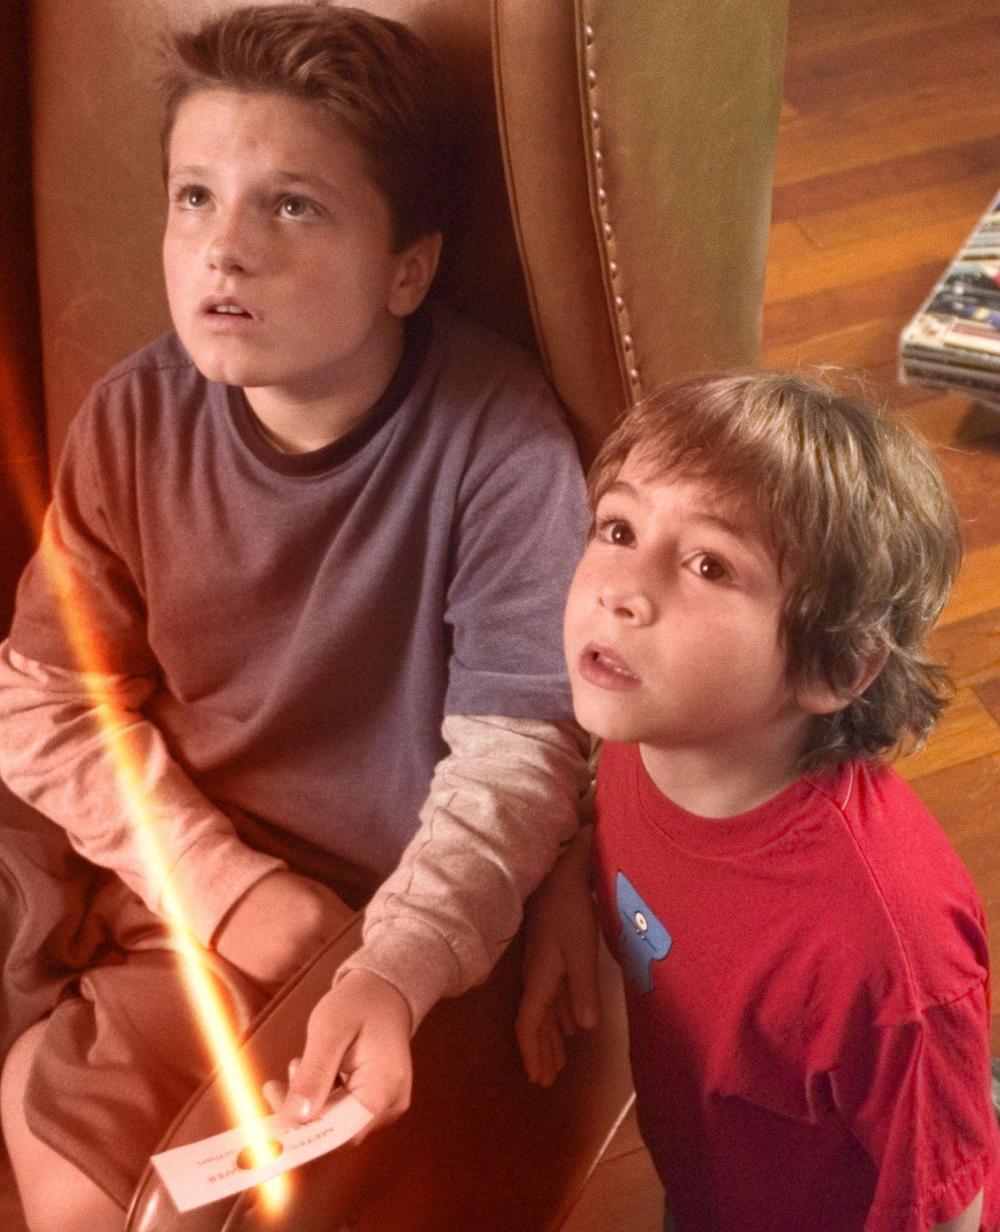 Zathura A Space Adventure 2006 Directed By Jon Favreau Film Review